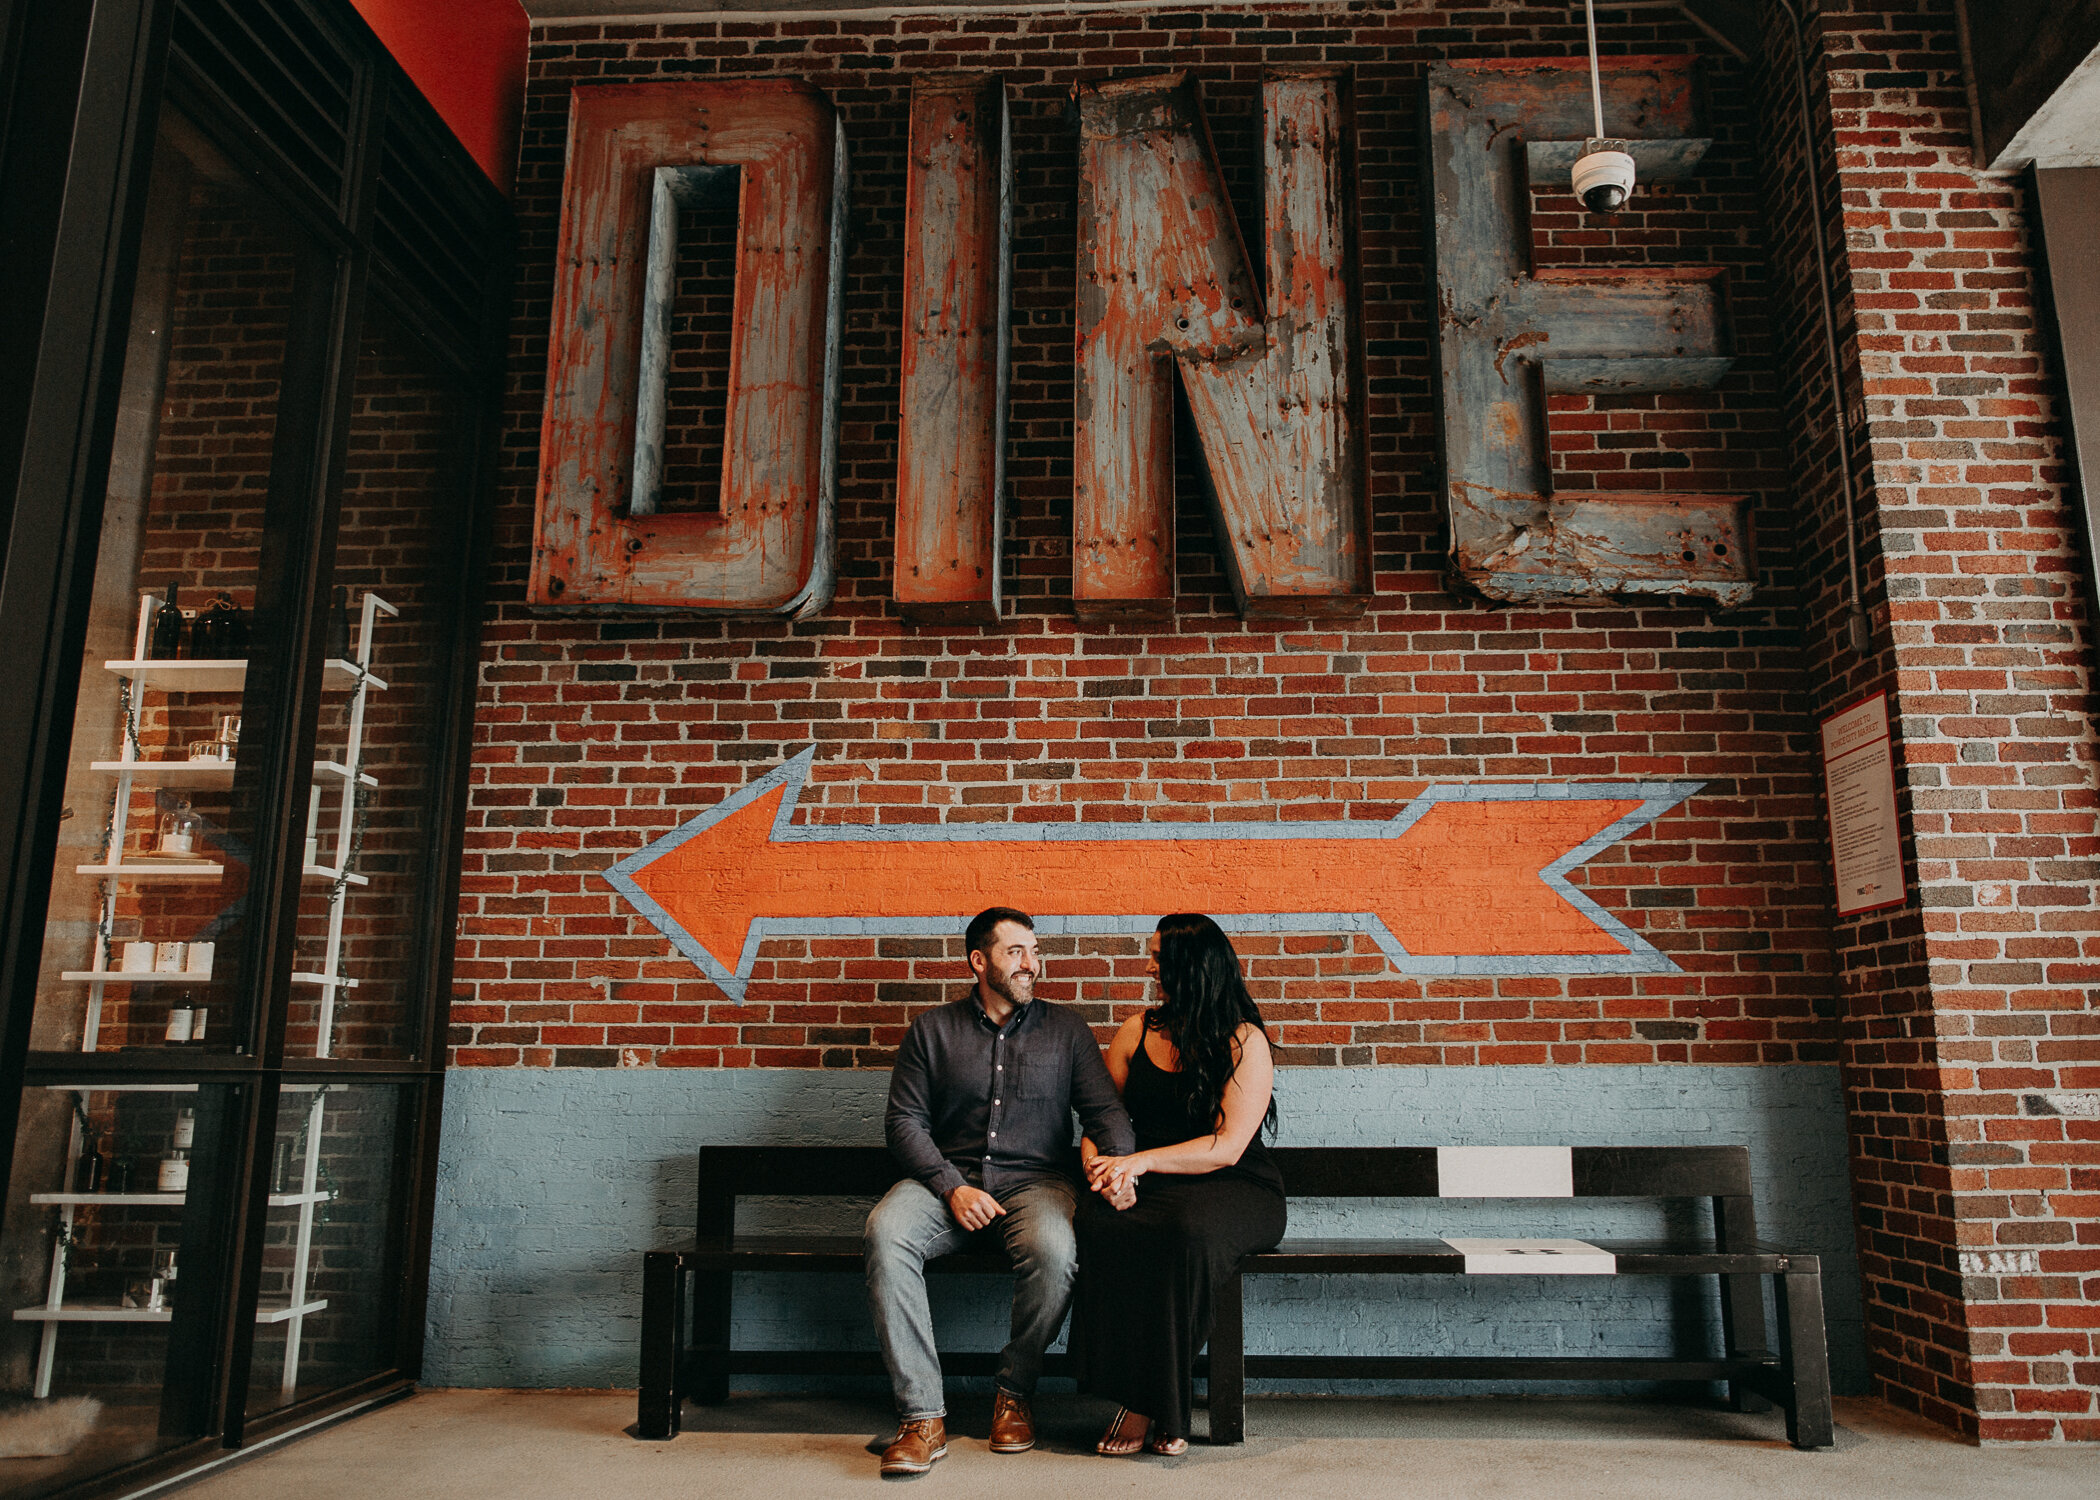 Aline_Marin_Photography_Ponce_City_Market_Atlanta_Ga_Engagement_Session_Ideas-4.jpg